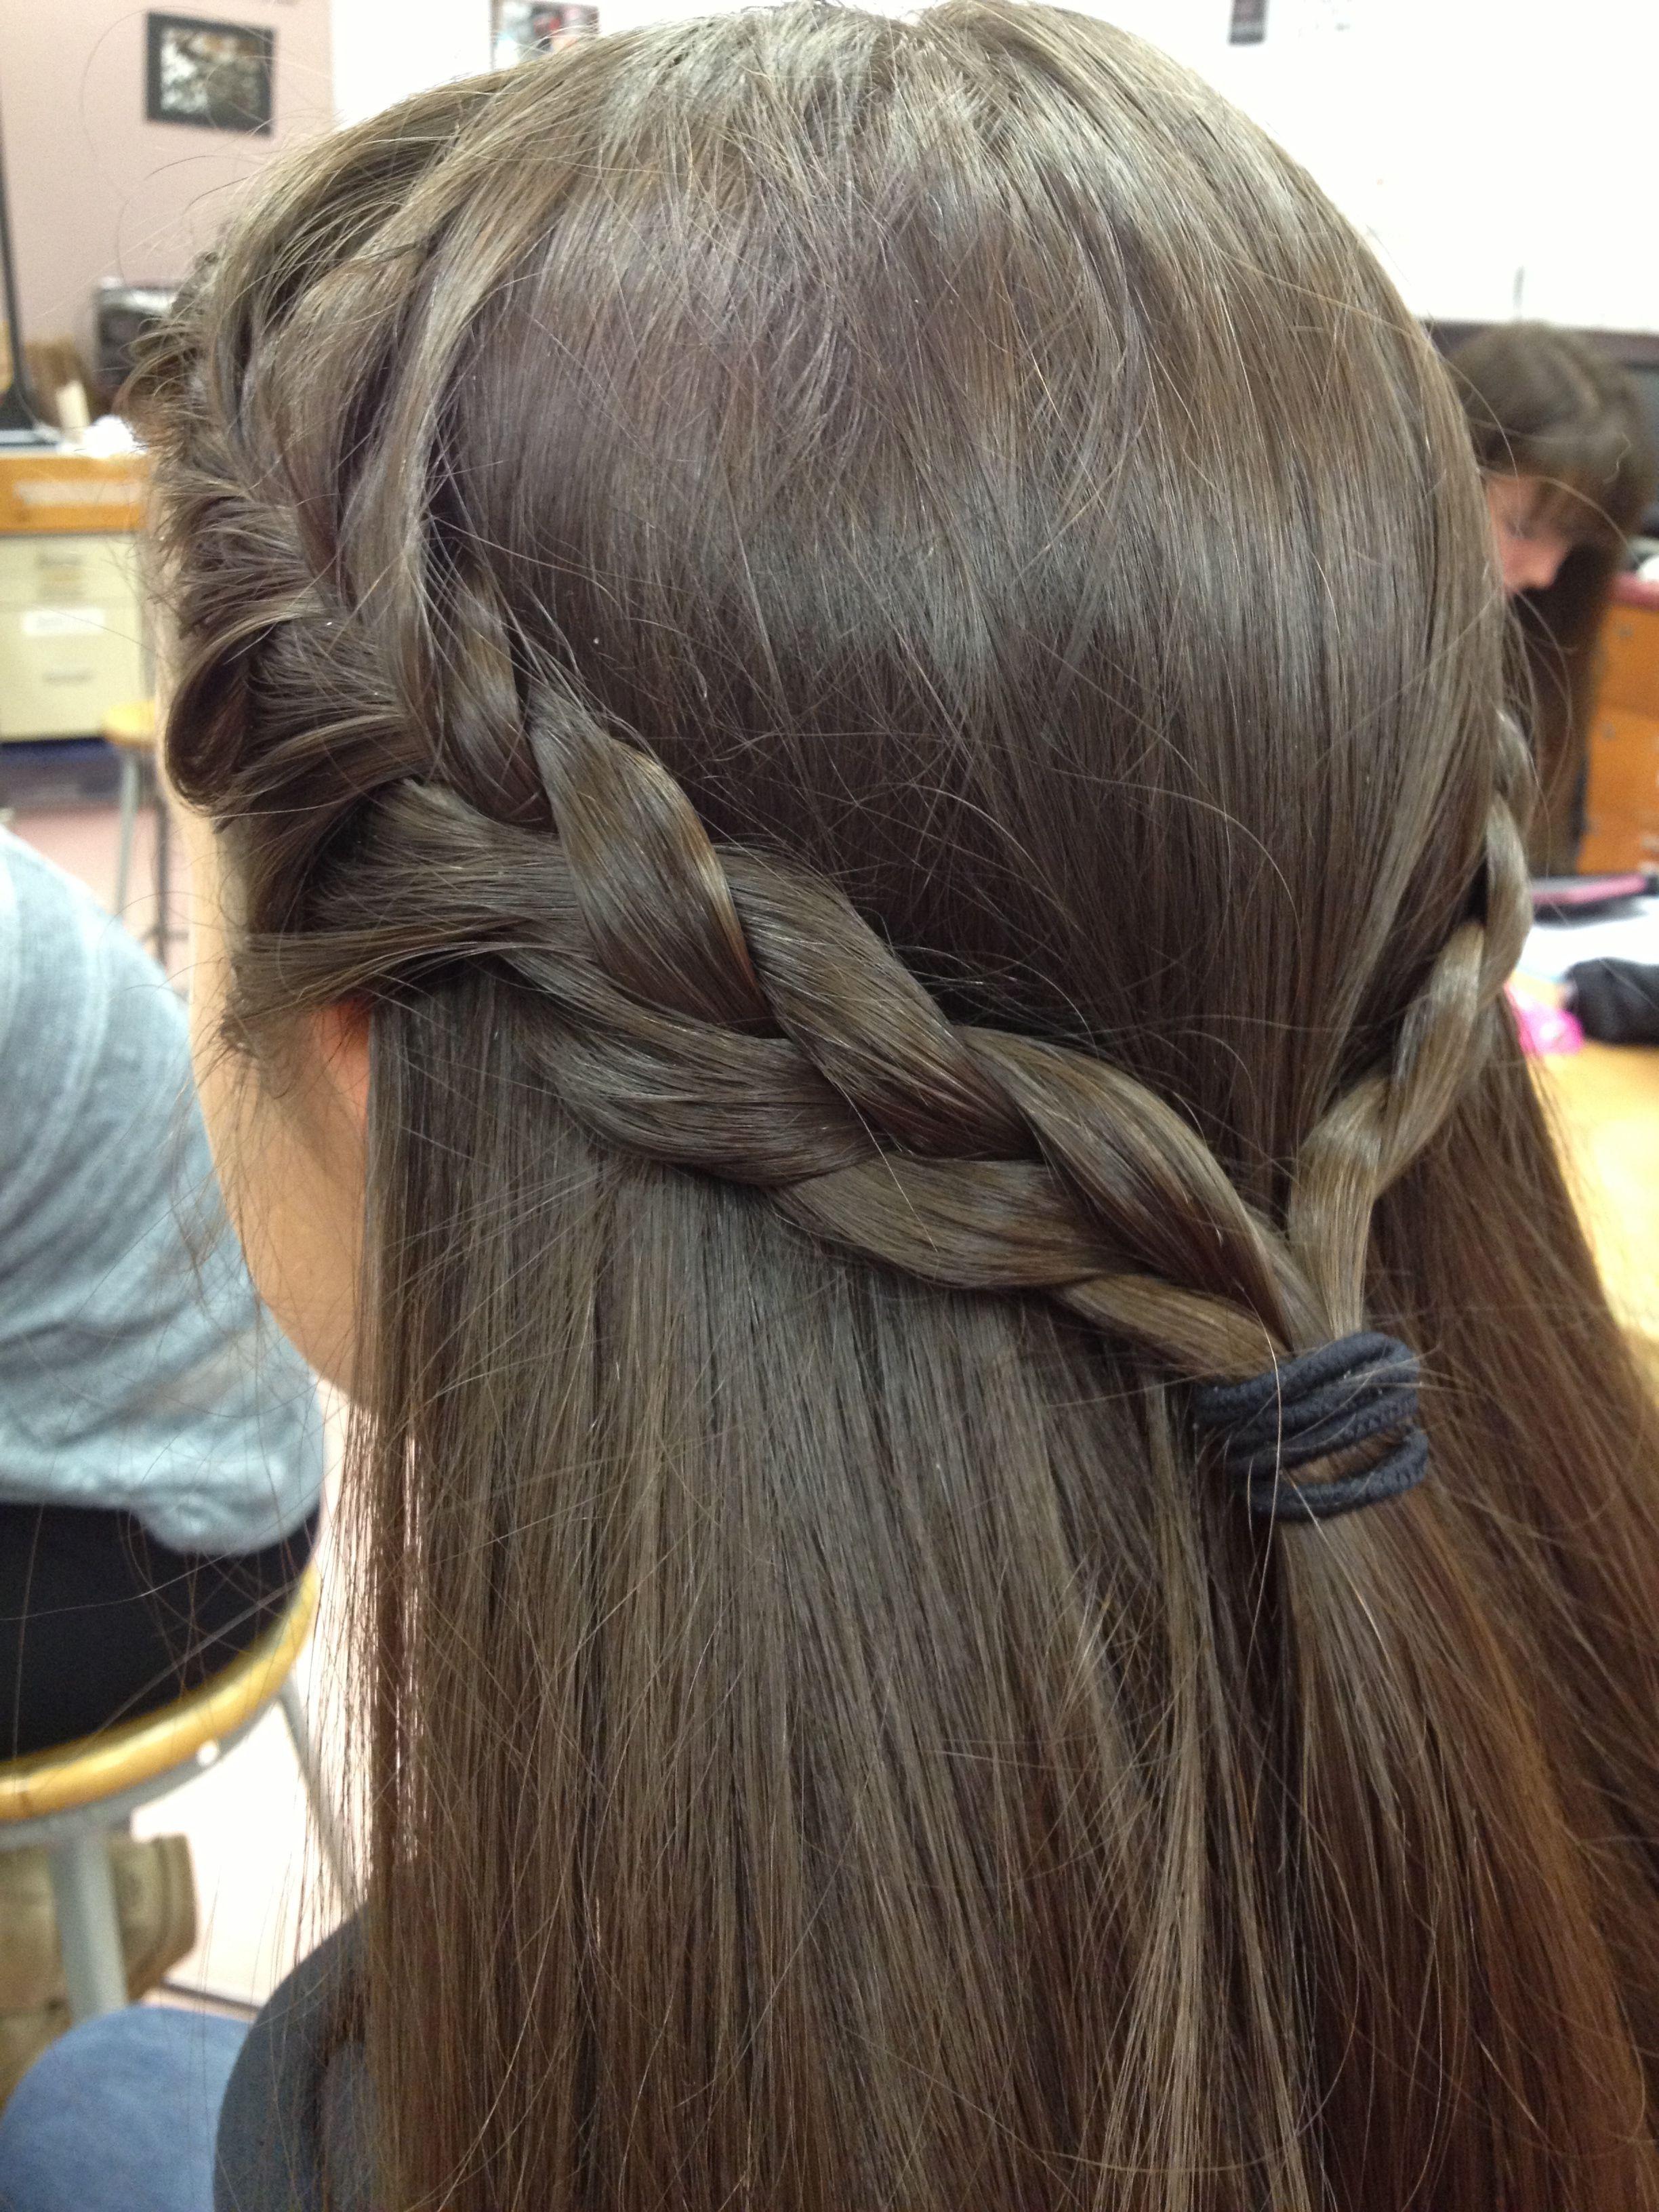 French Braid Into Half Up Half Down Hair Beauty Hair Styles Hairdo